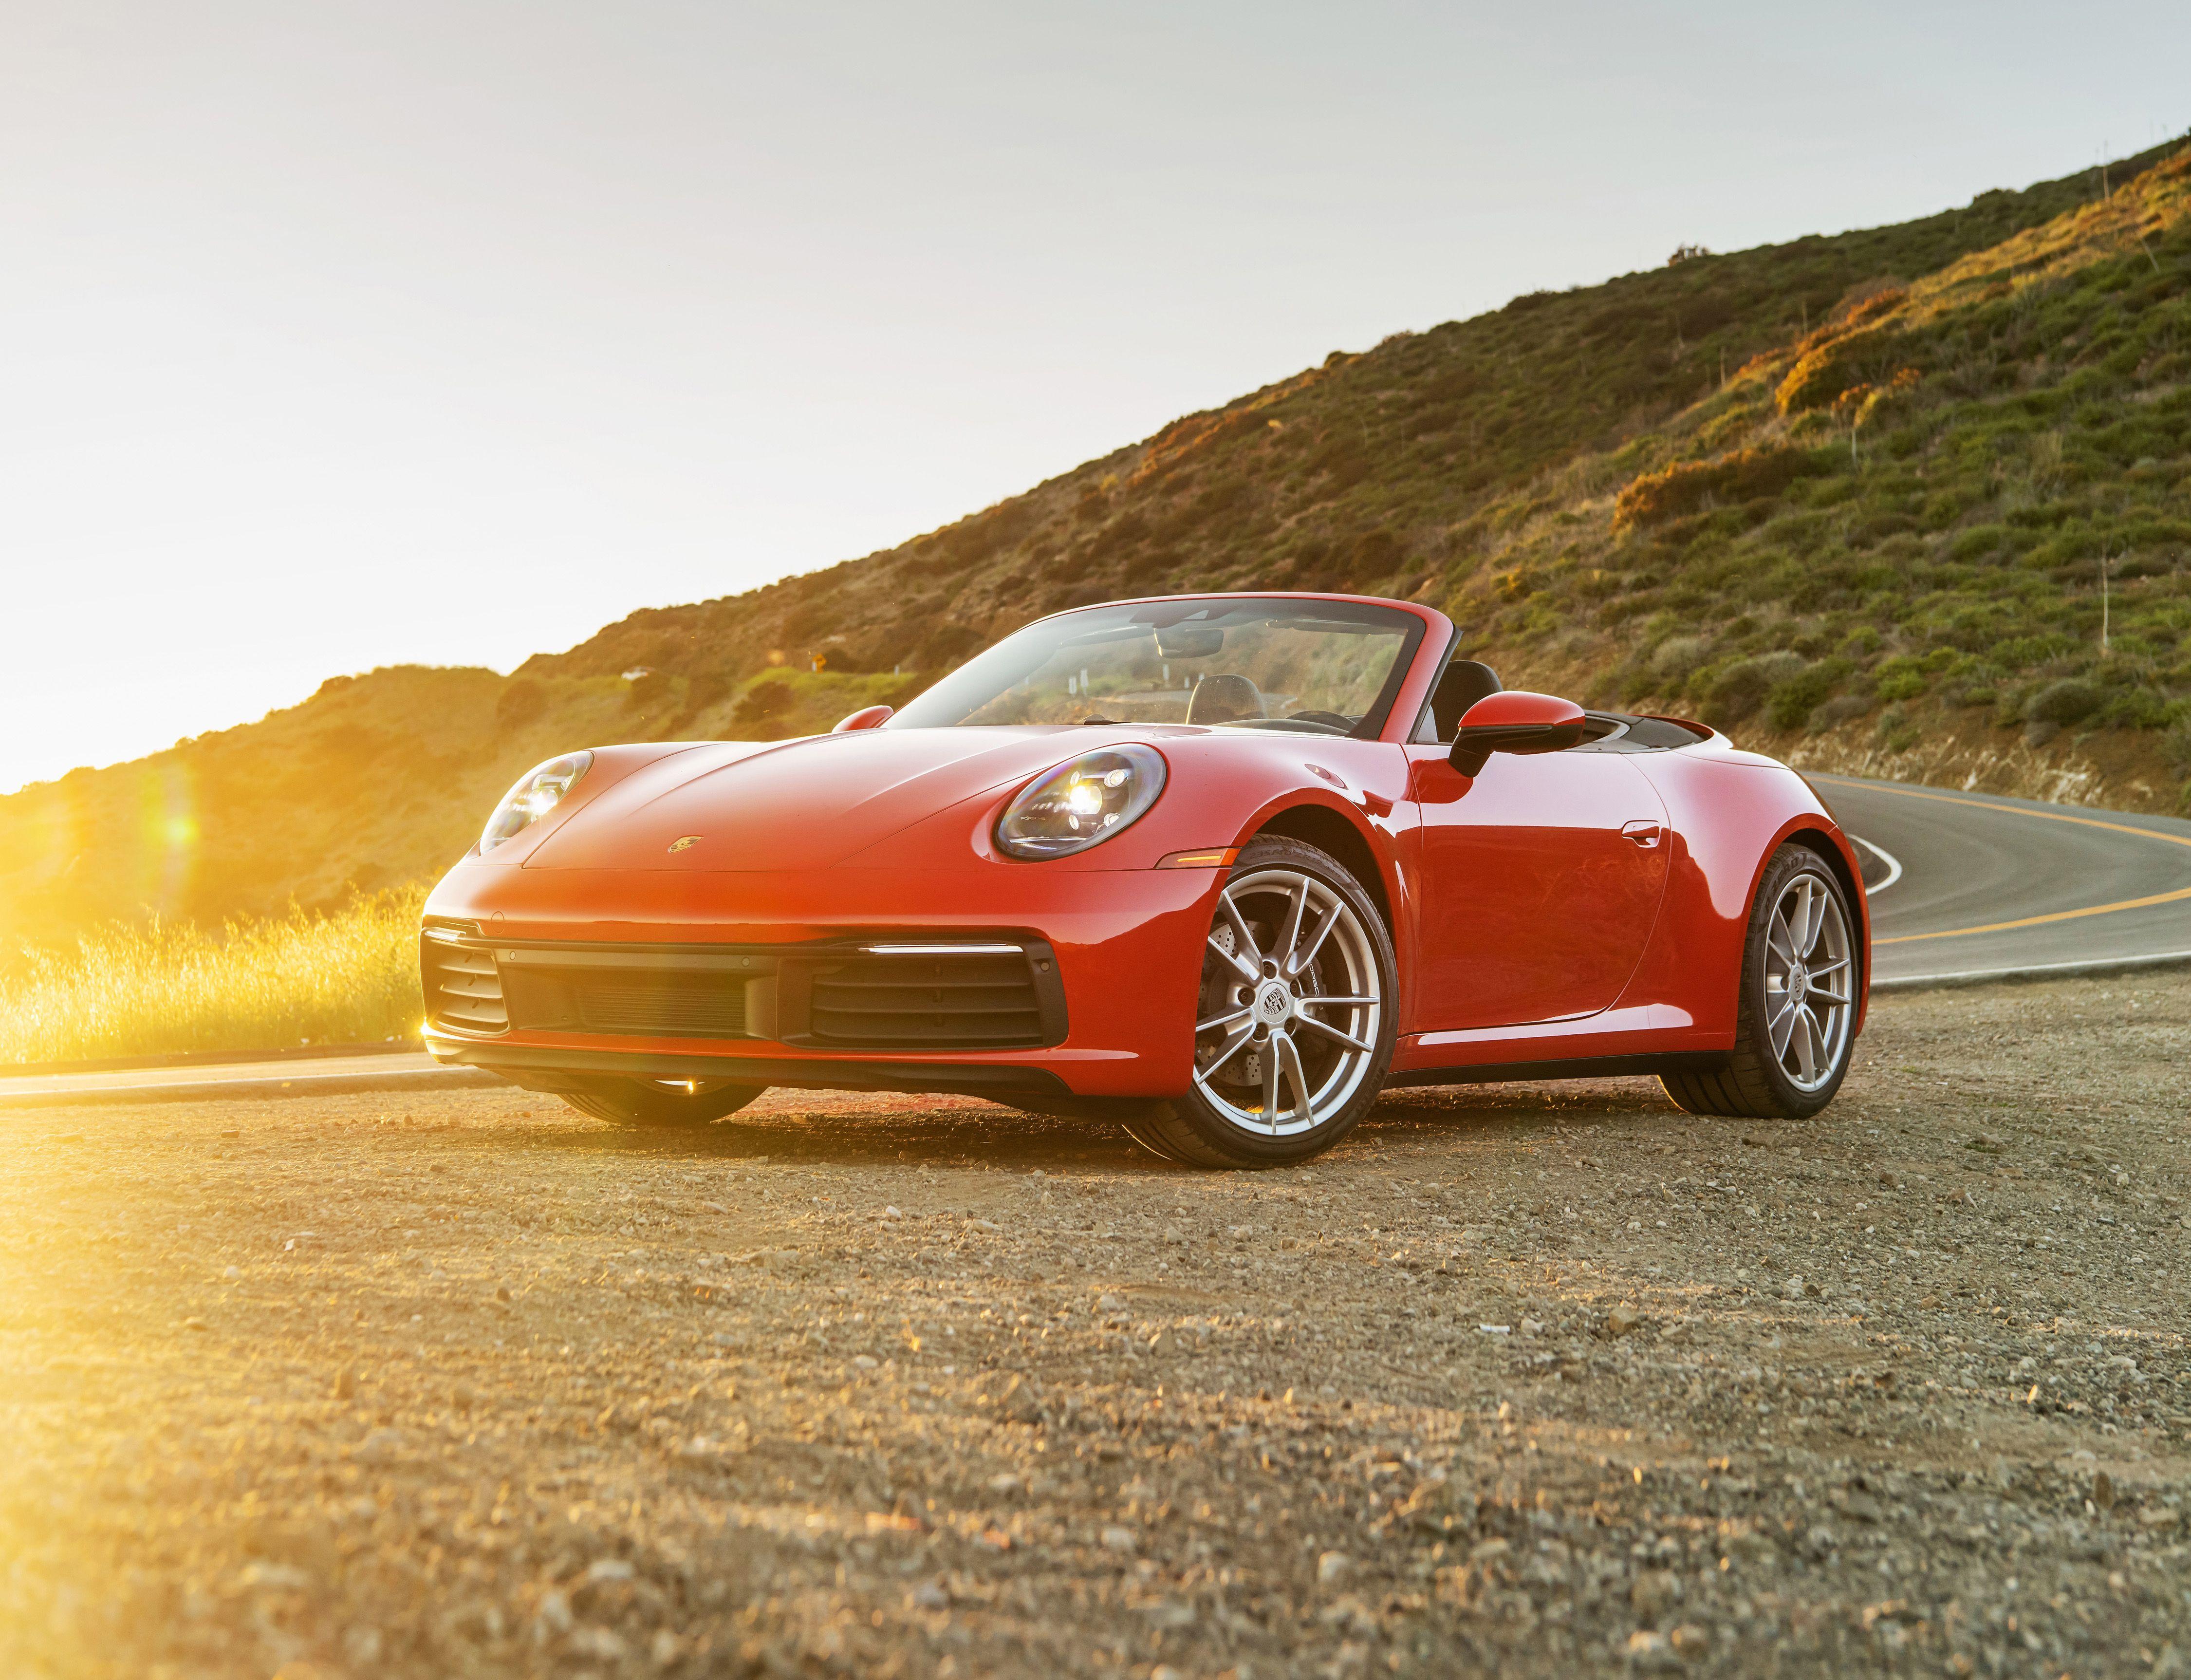 2020 Porsche 911 Carrera Cabriolet Redefines Entry Level